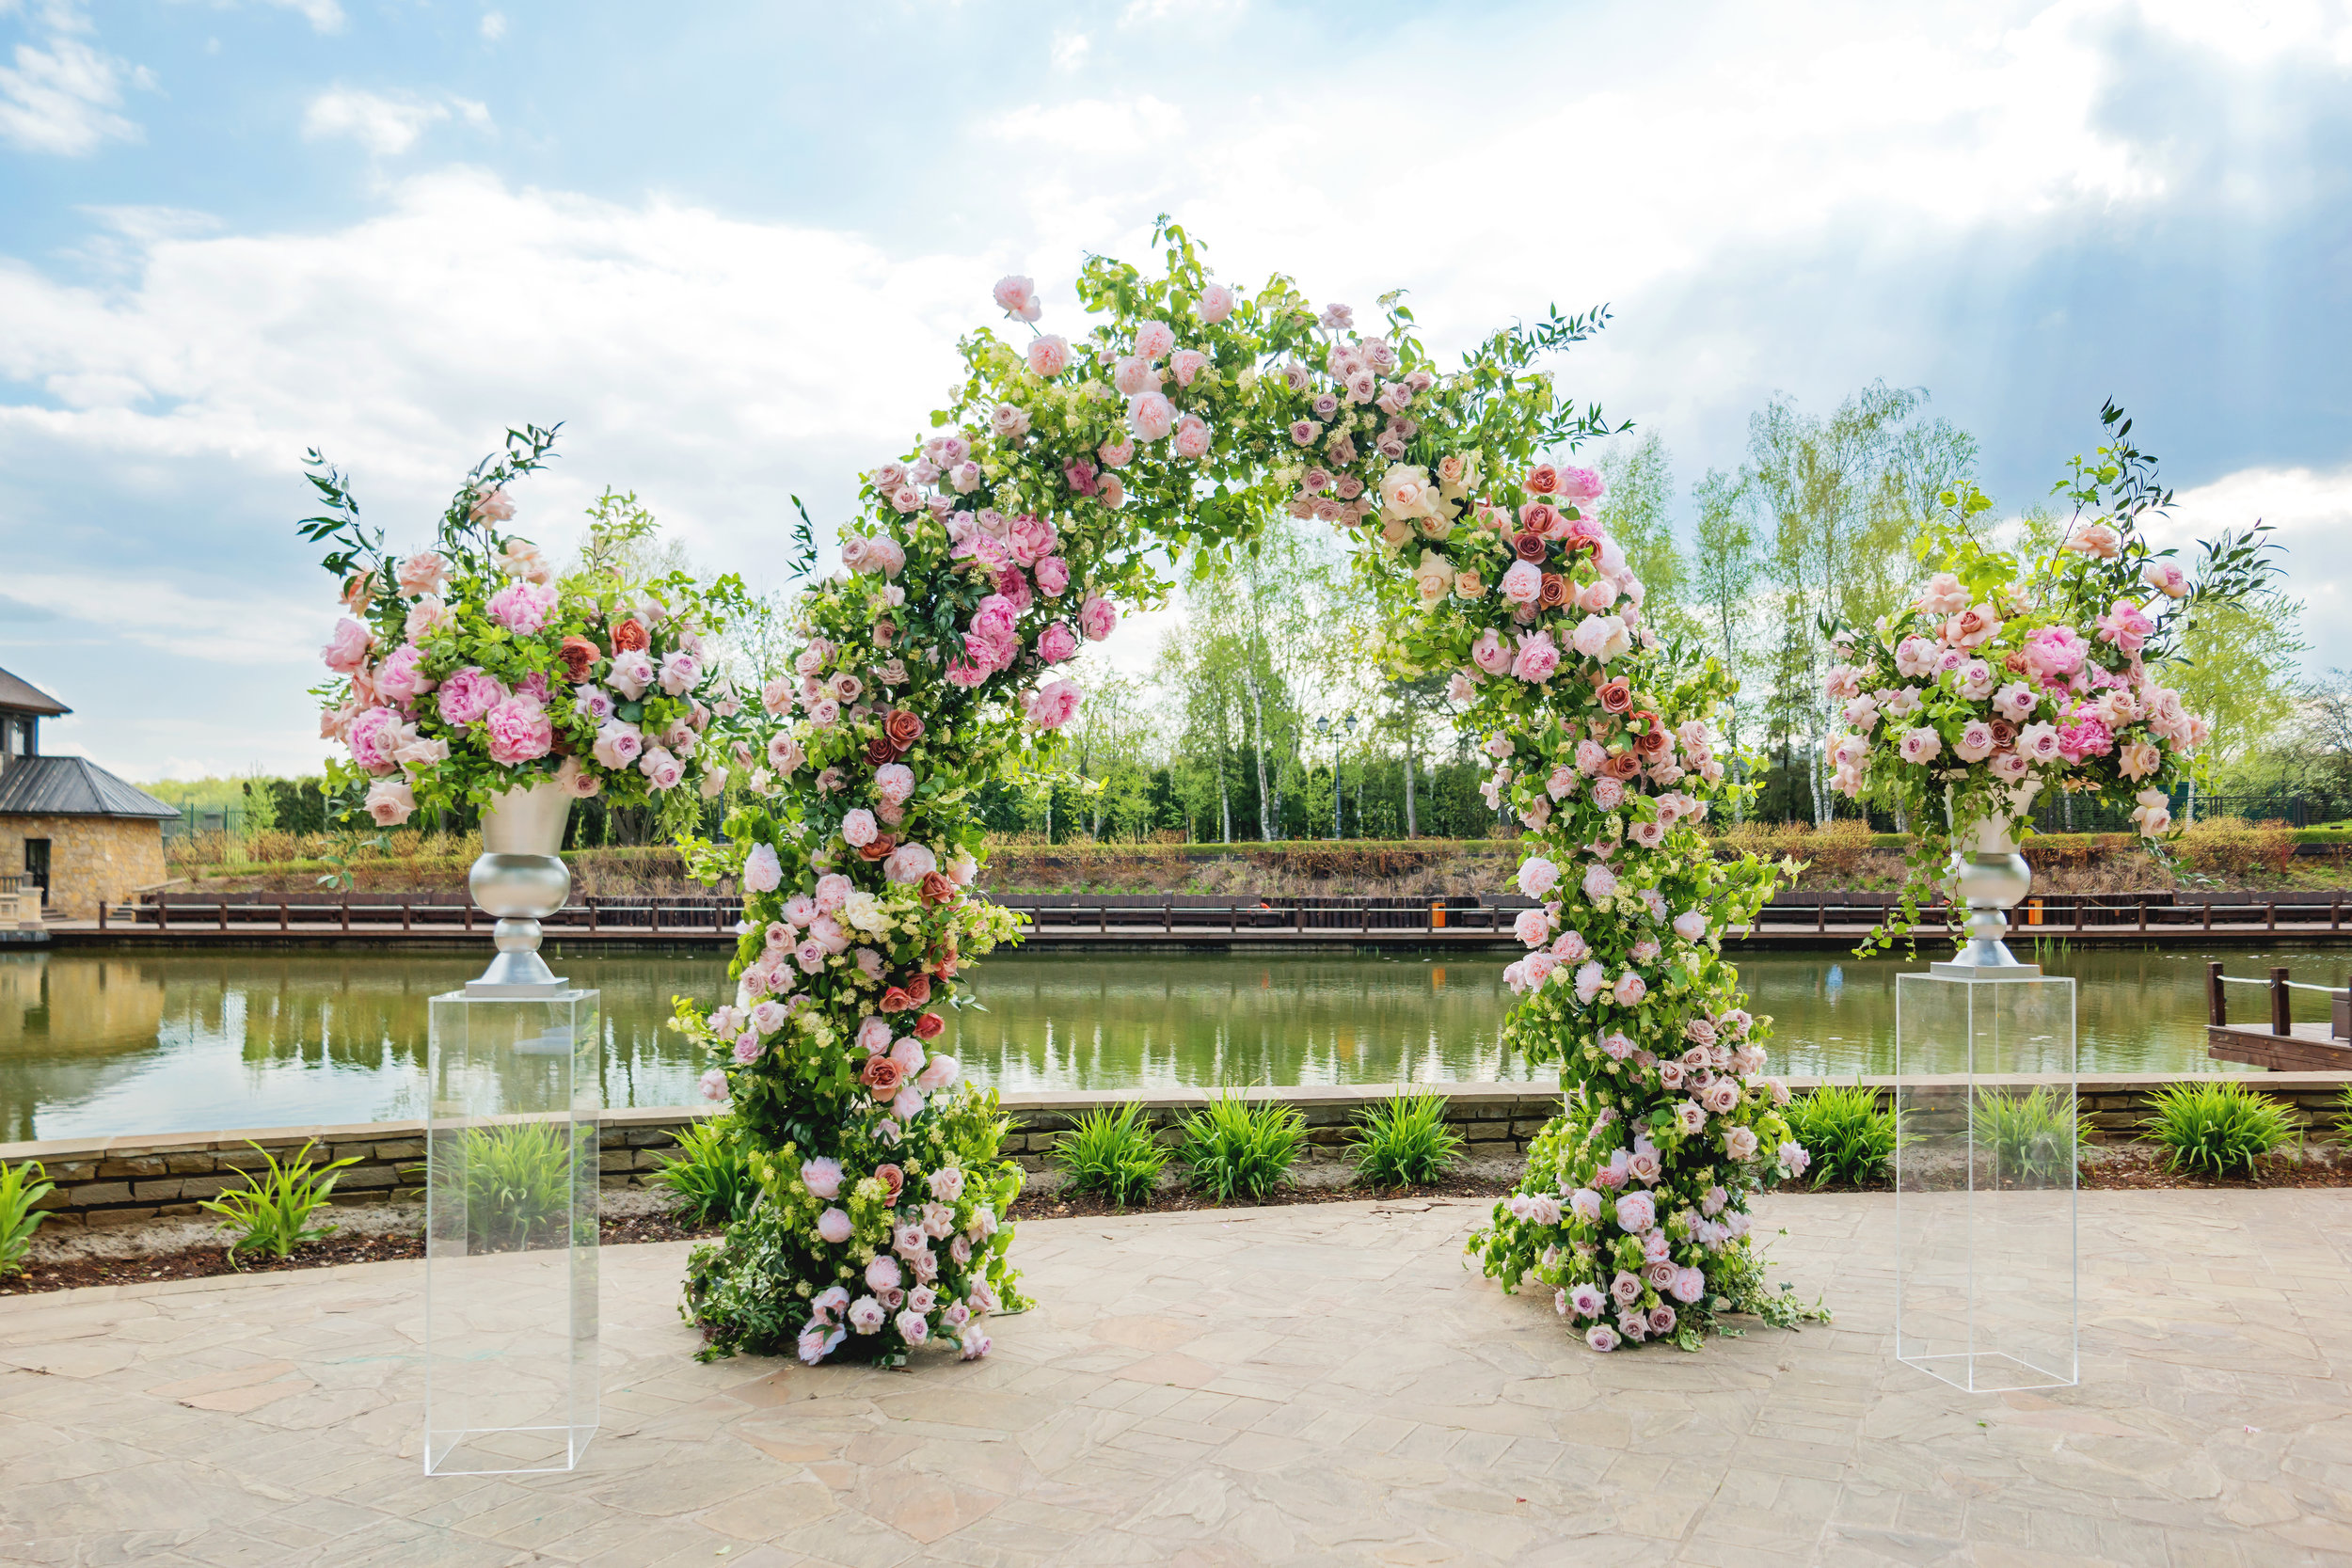 Olive Sky_Weddings Abroad46.jpeg